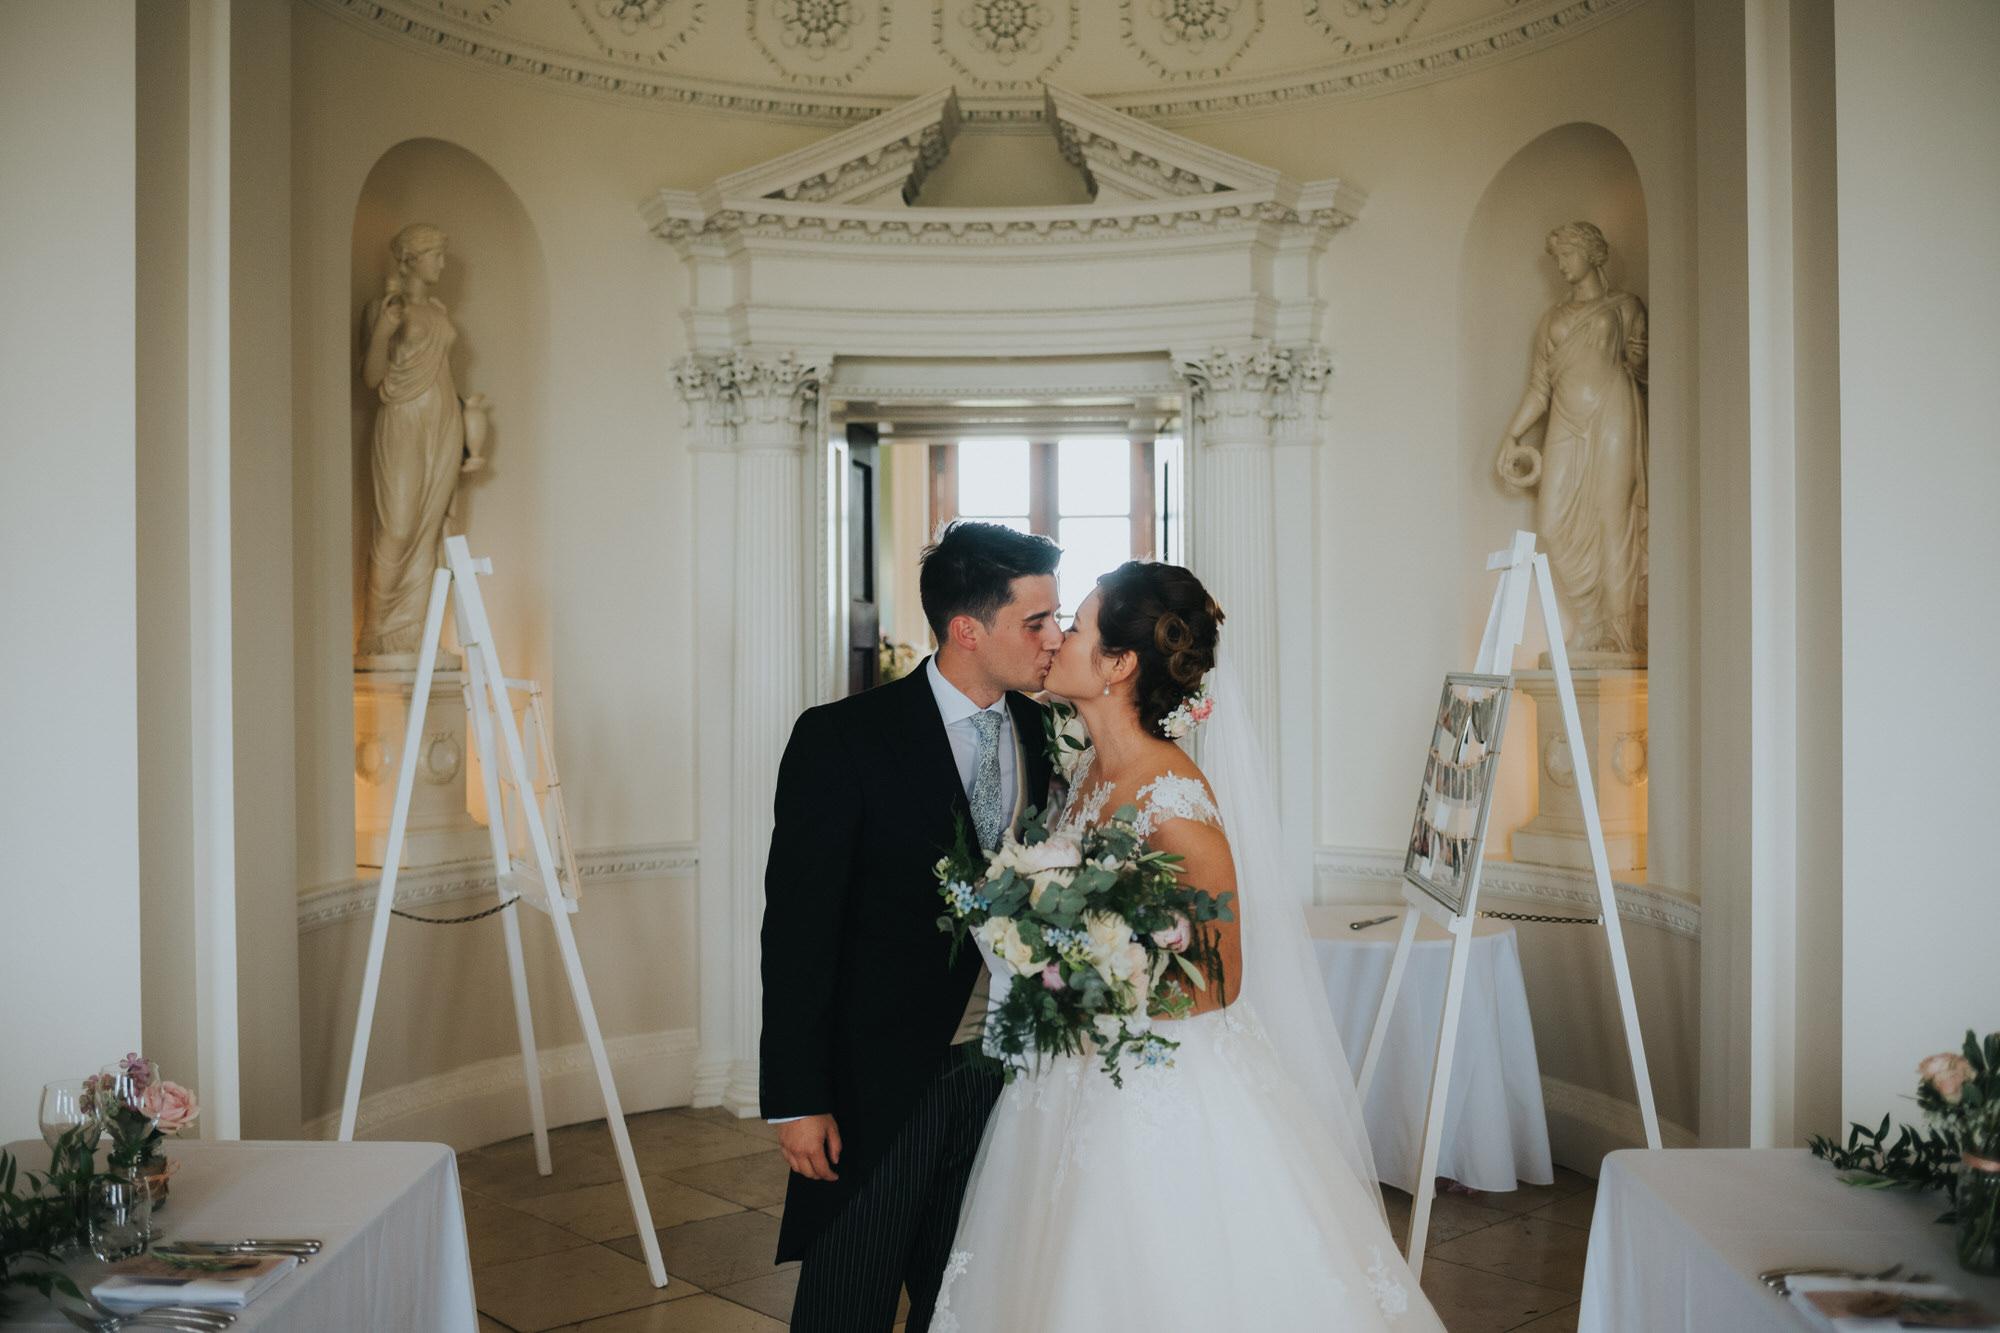 Just married at Kirtlington park